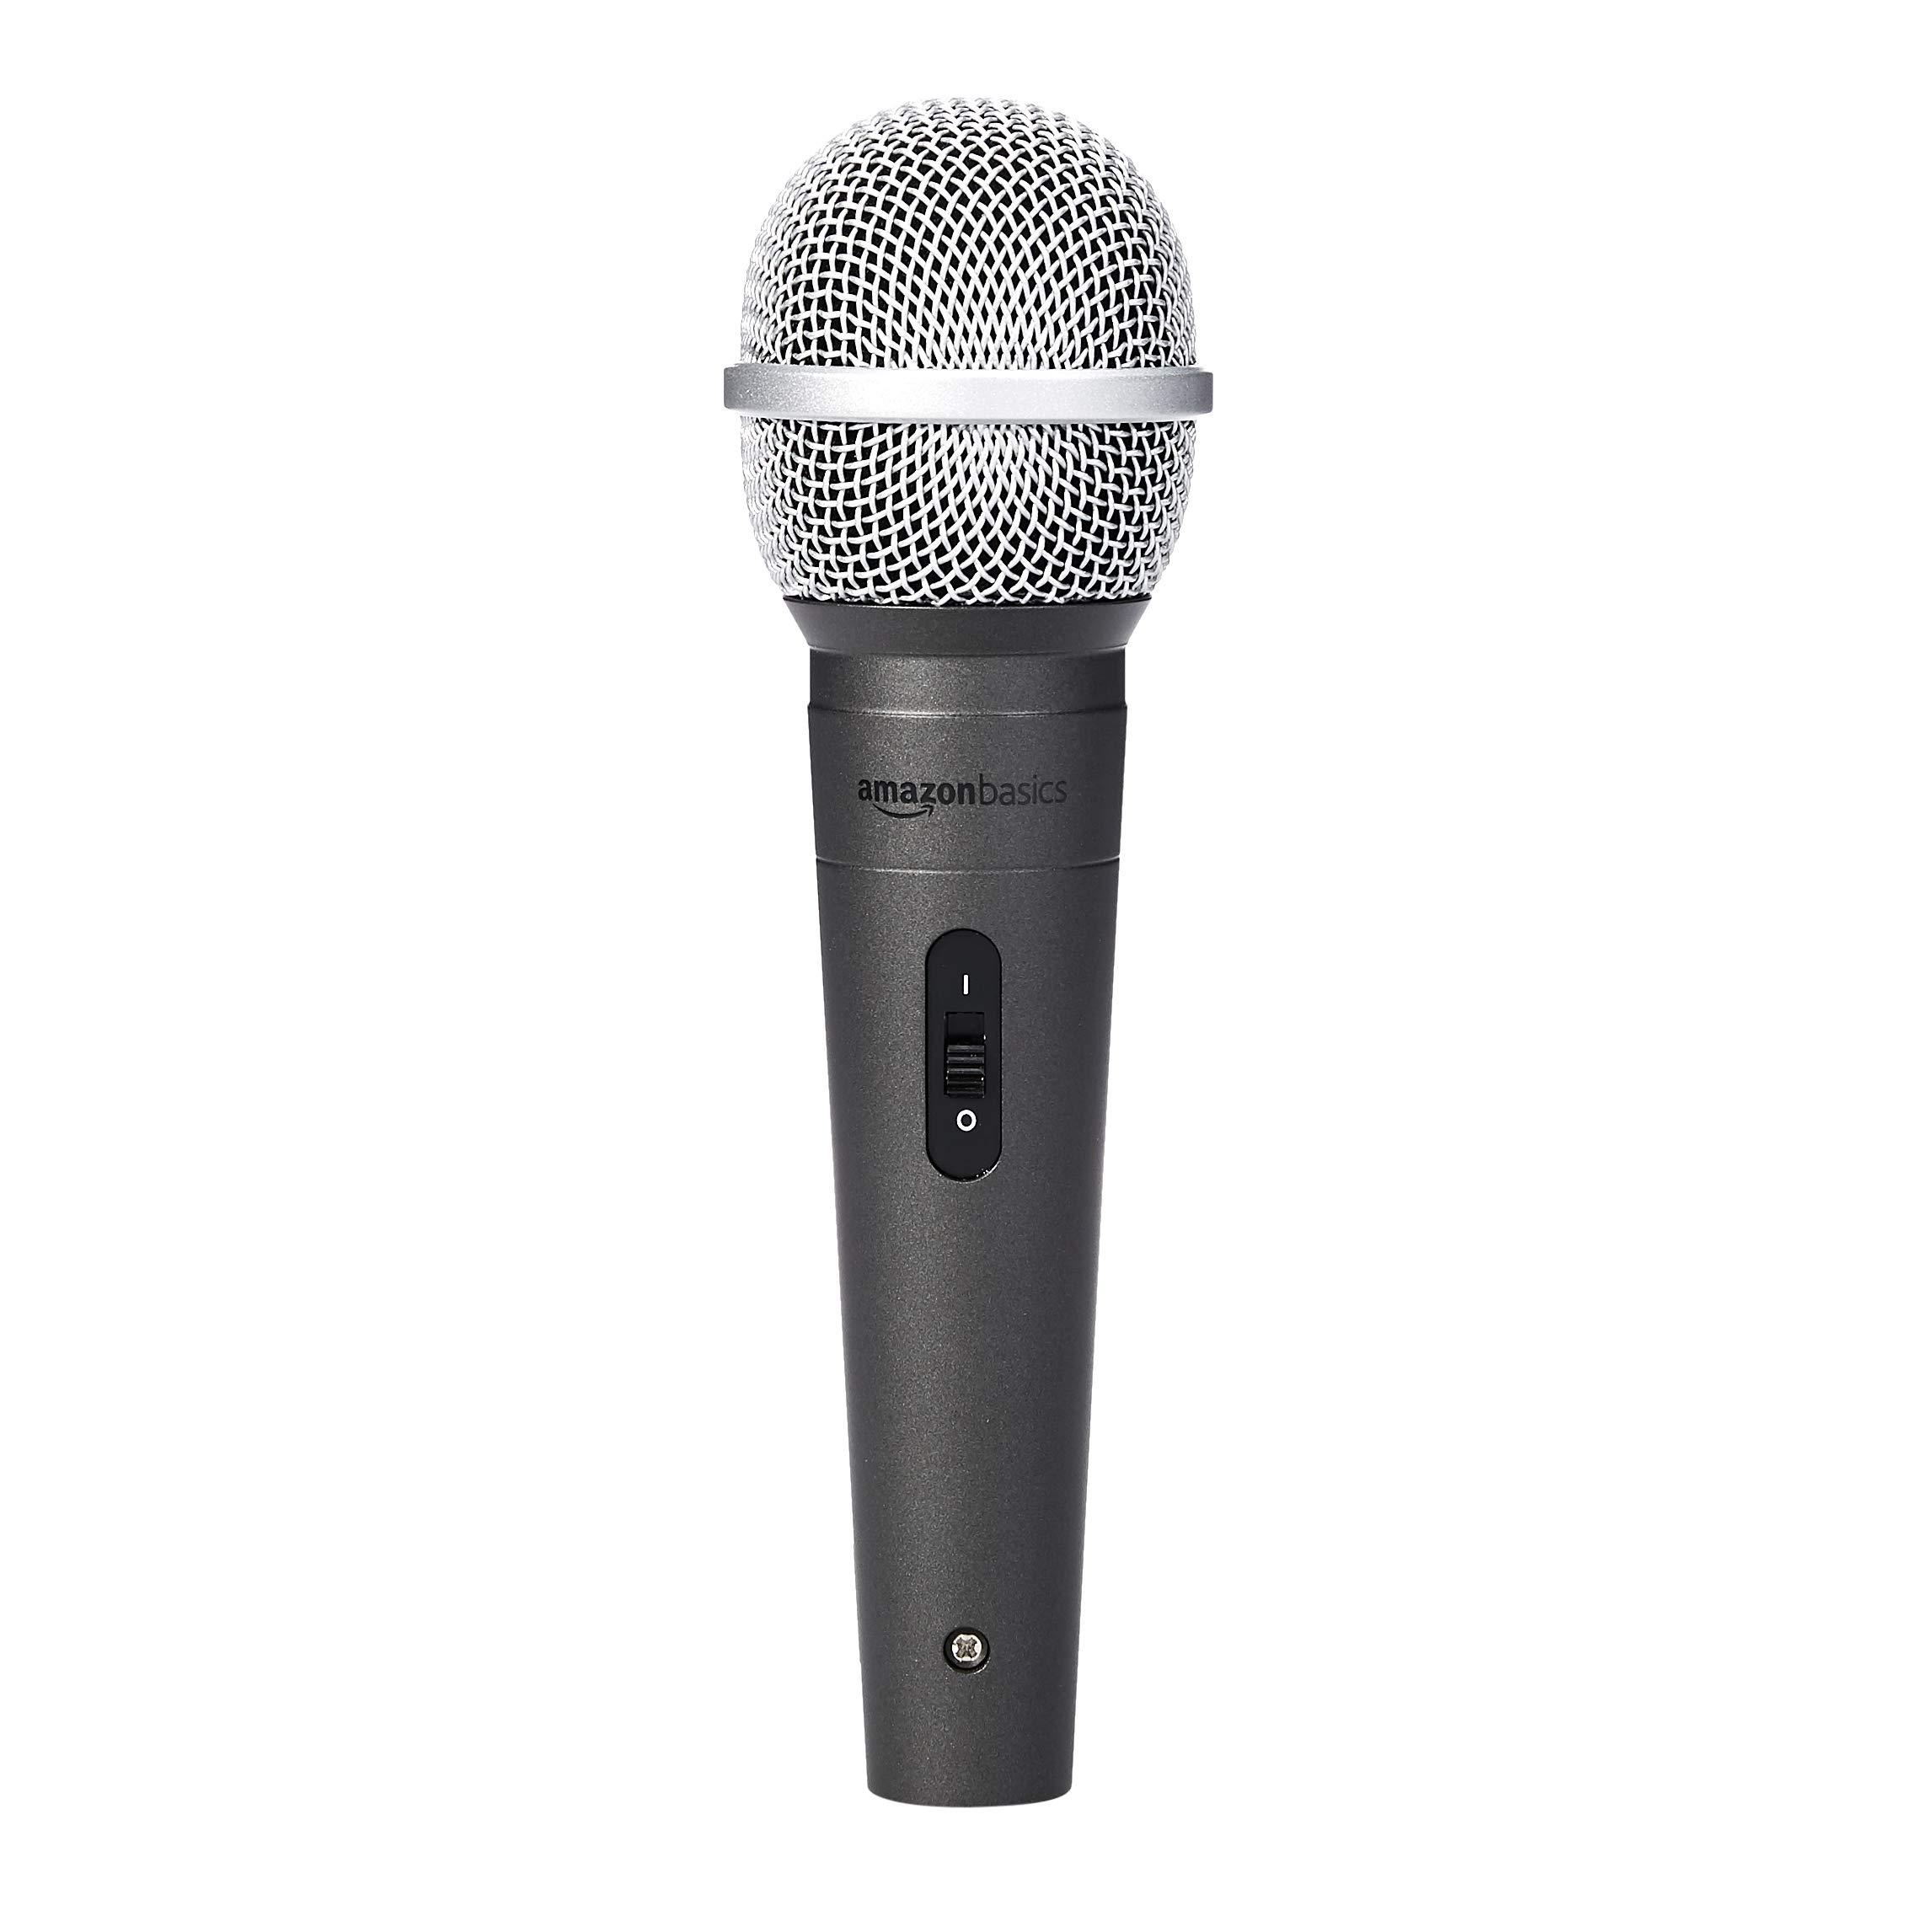 AmazonBasics Dynamic Vocal Microphone - Cardioid by AmazonBasics